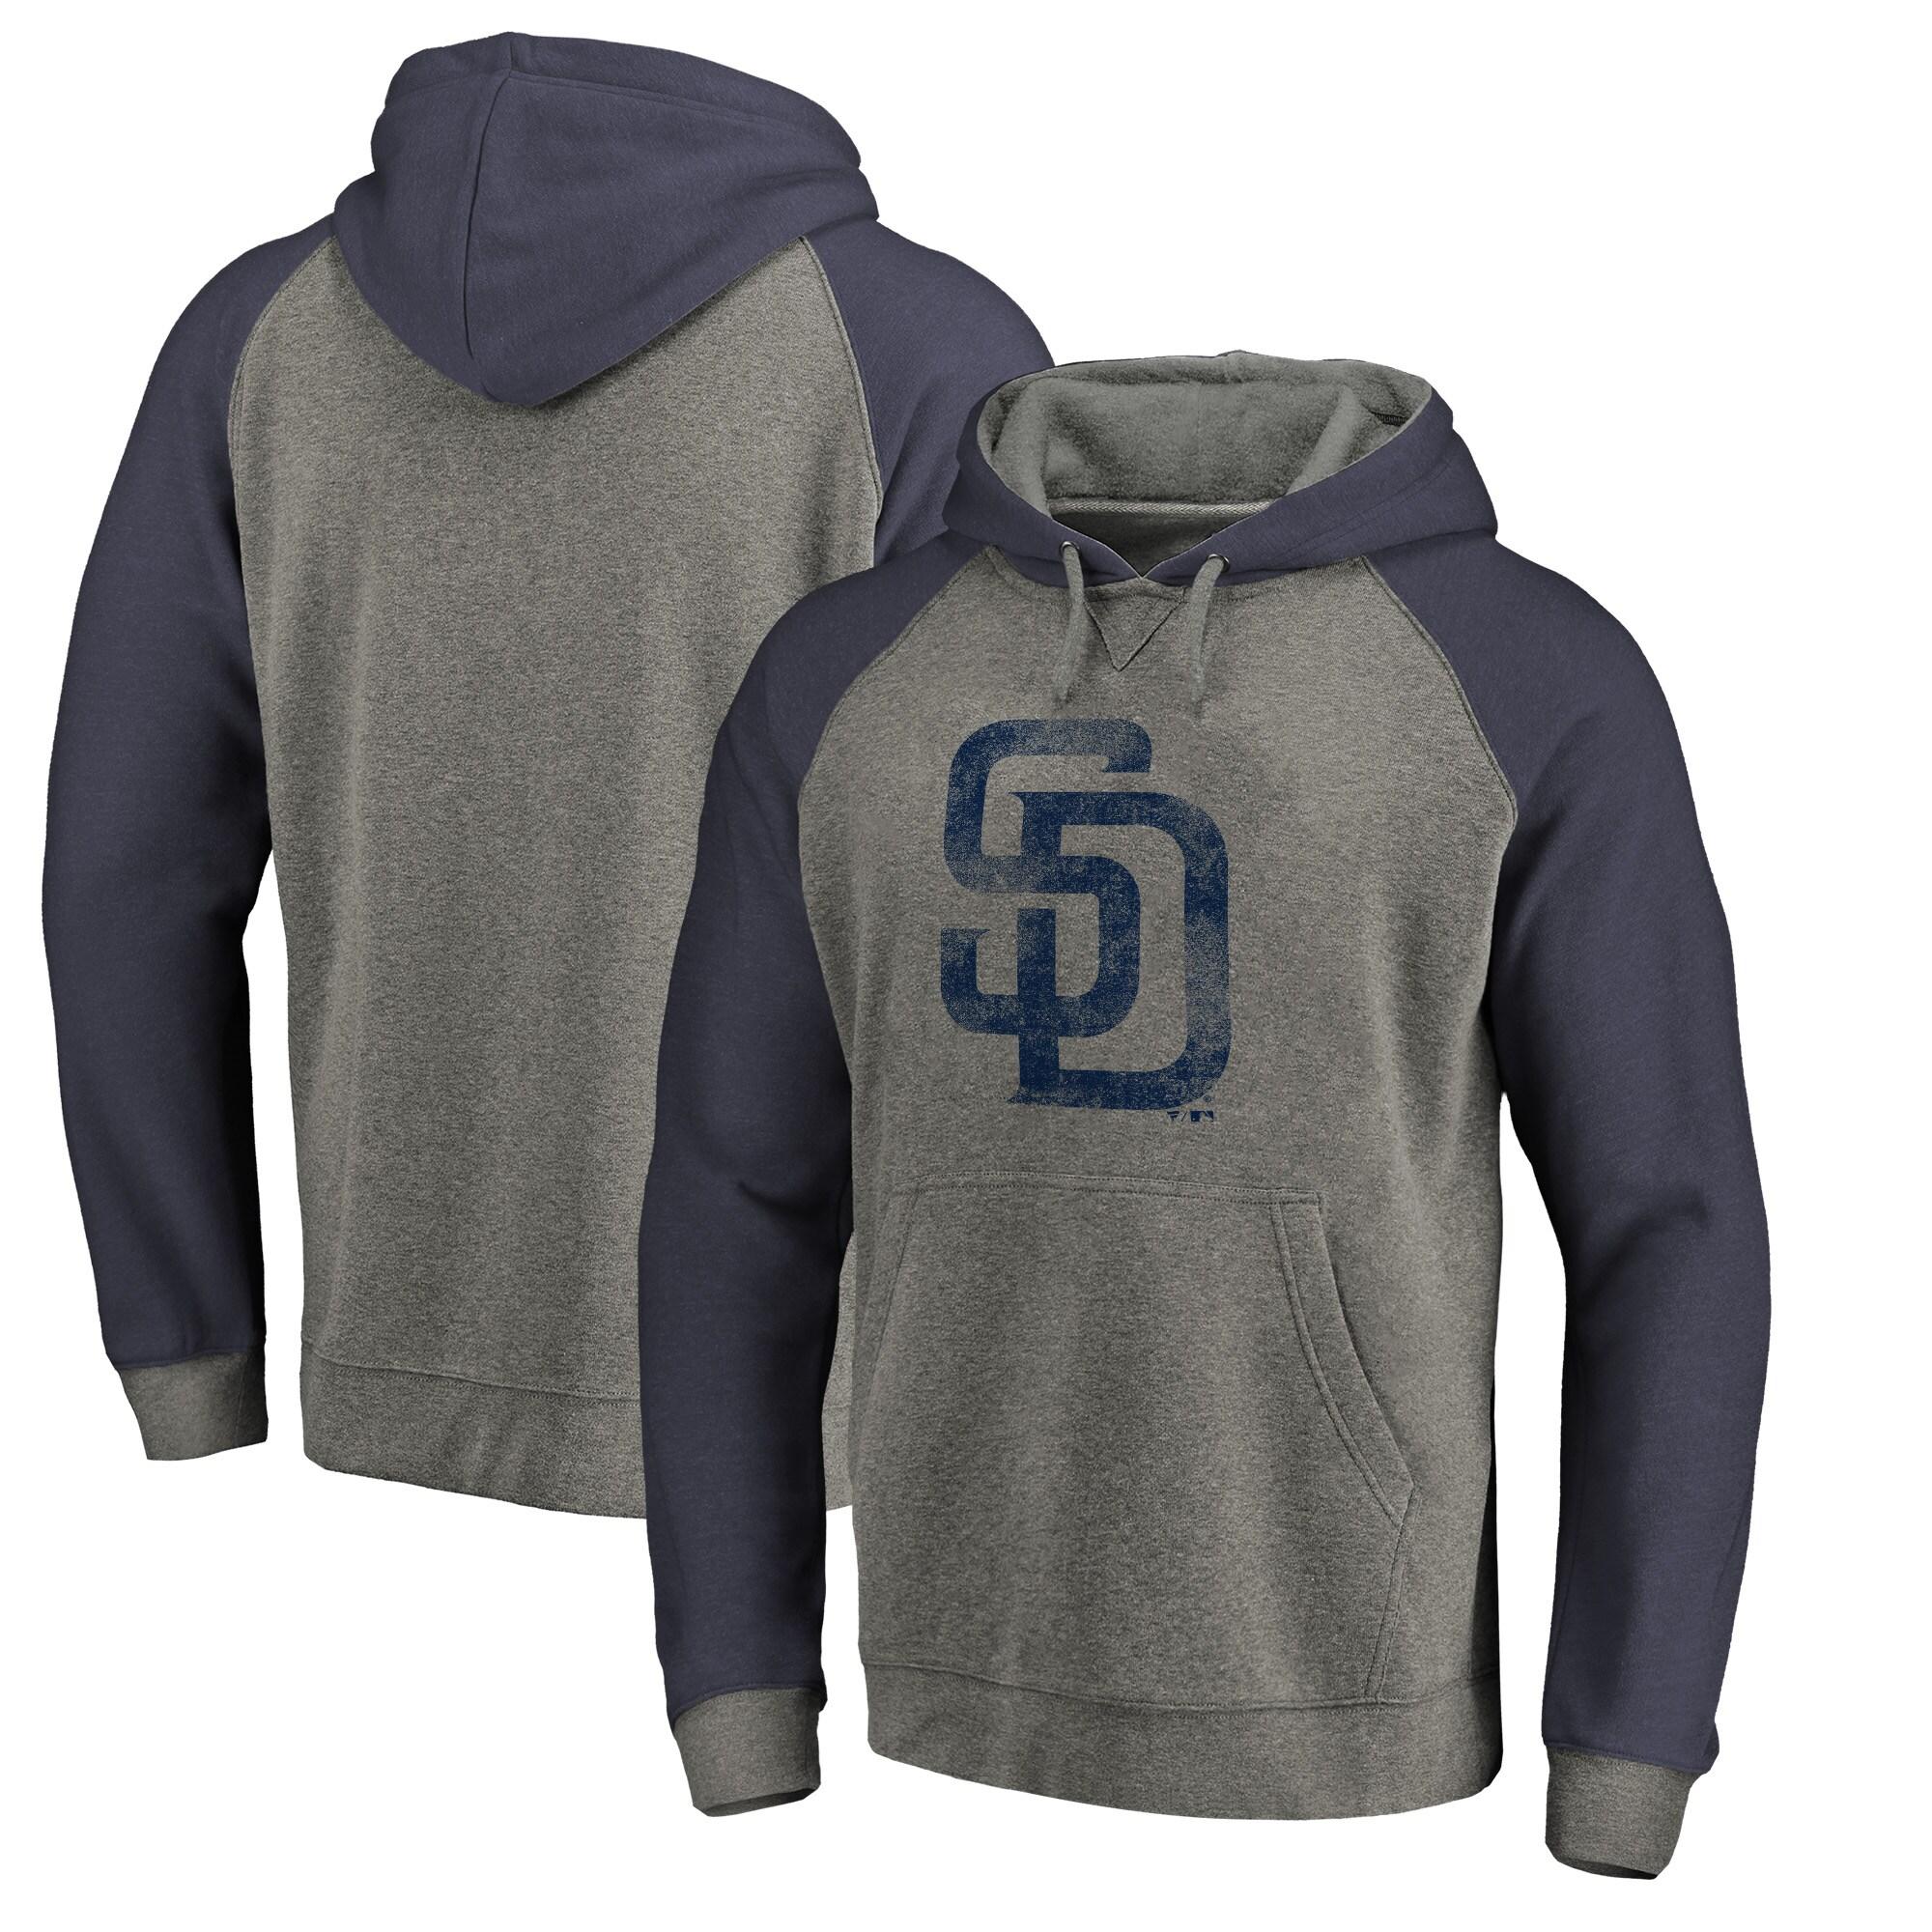 San Diego Padres Fanatics Branded Distressed Team Logo Tri-Blend Raglan Pullover Hoodie - Gray/Navy